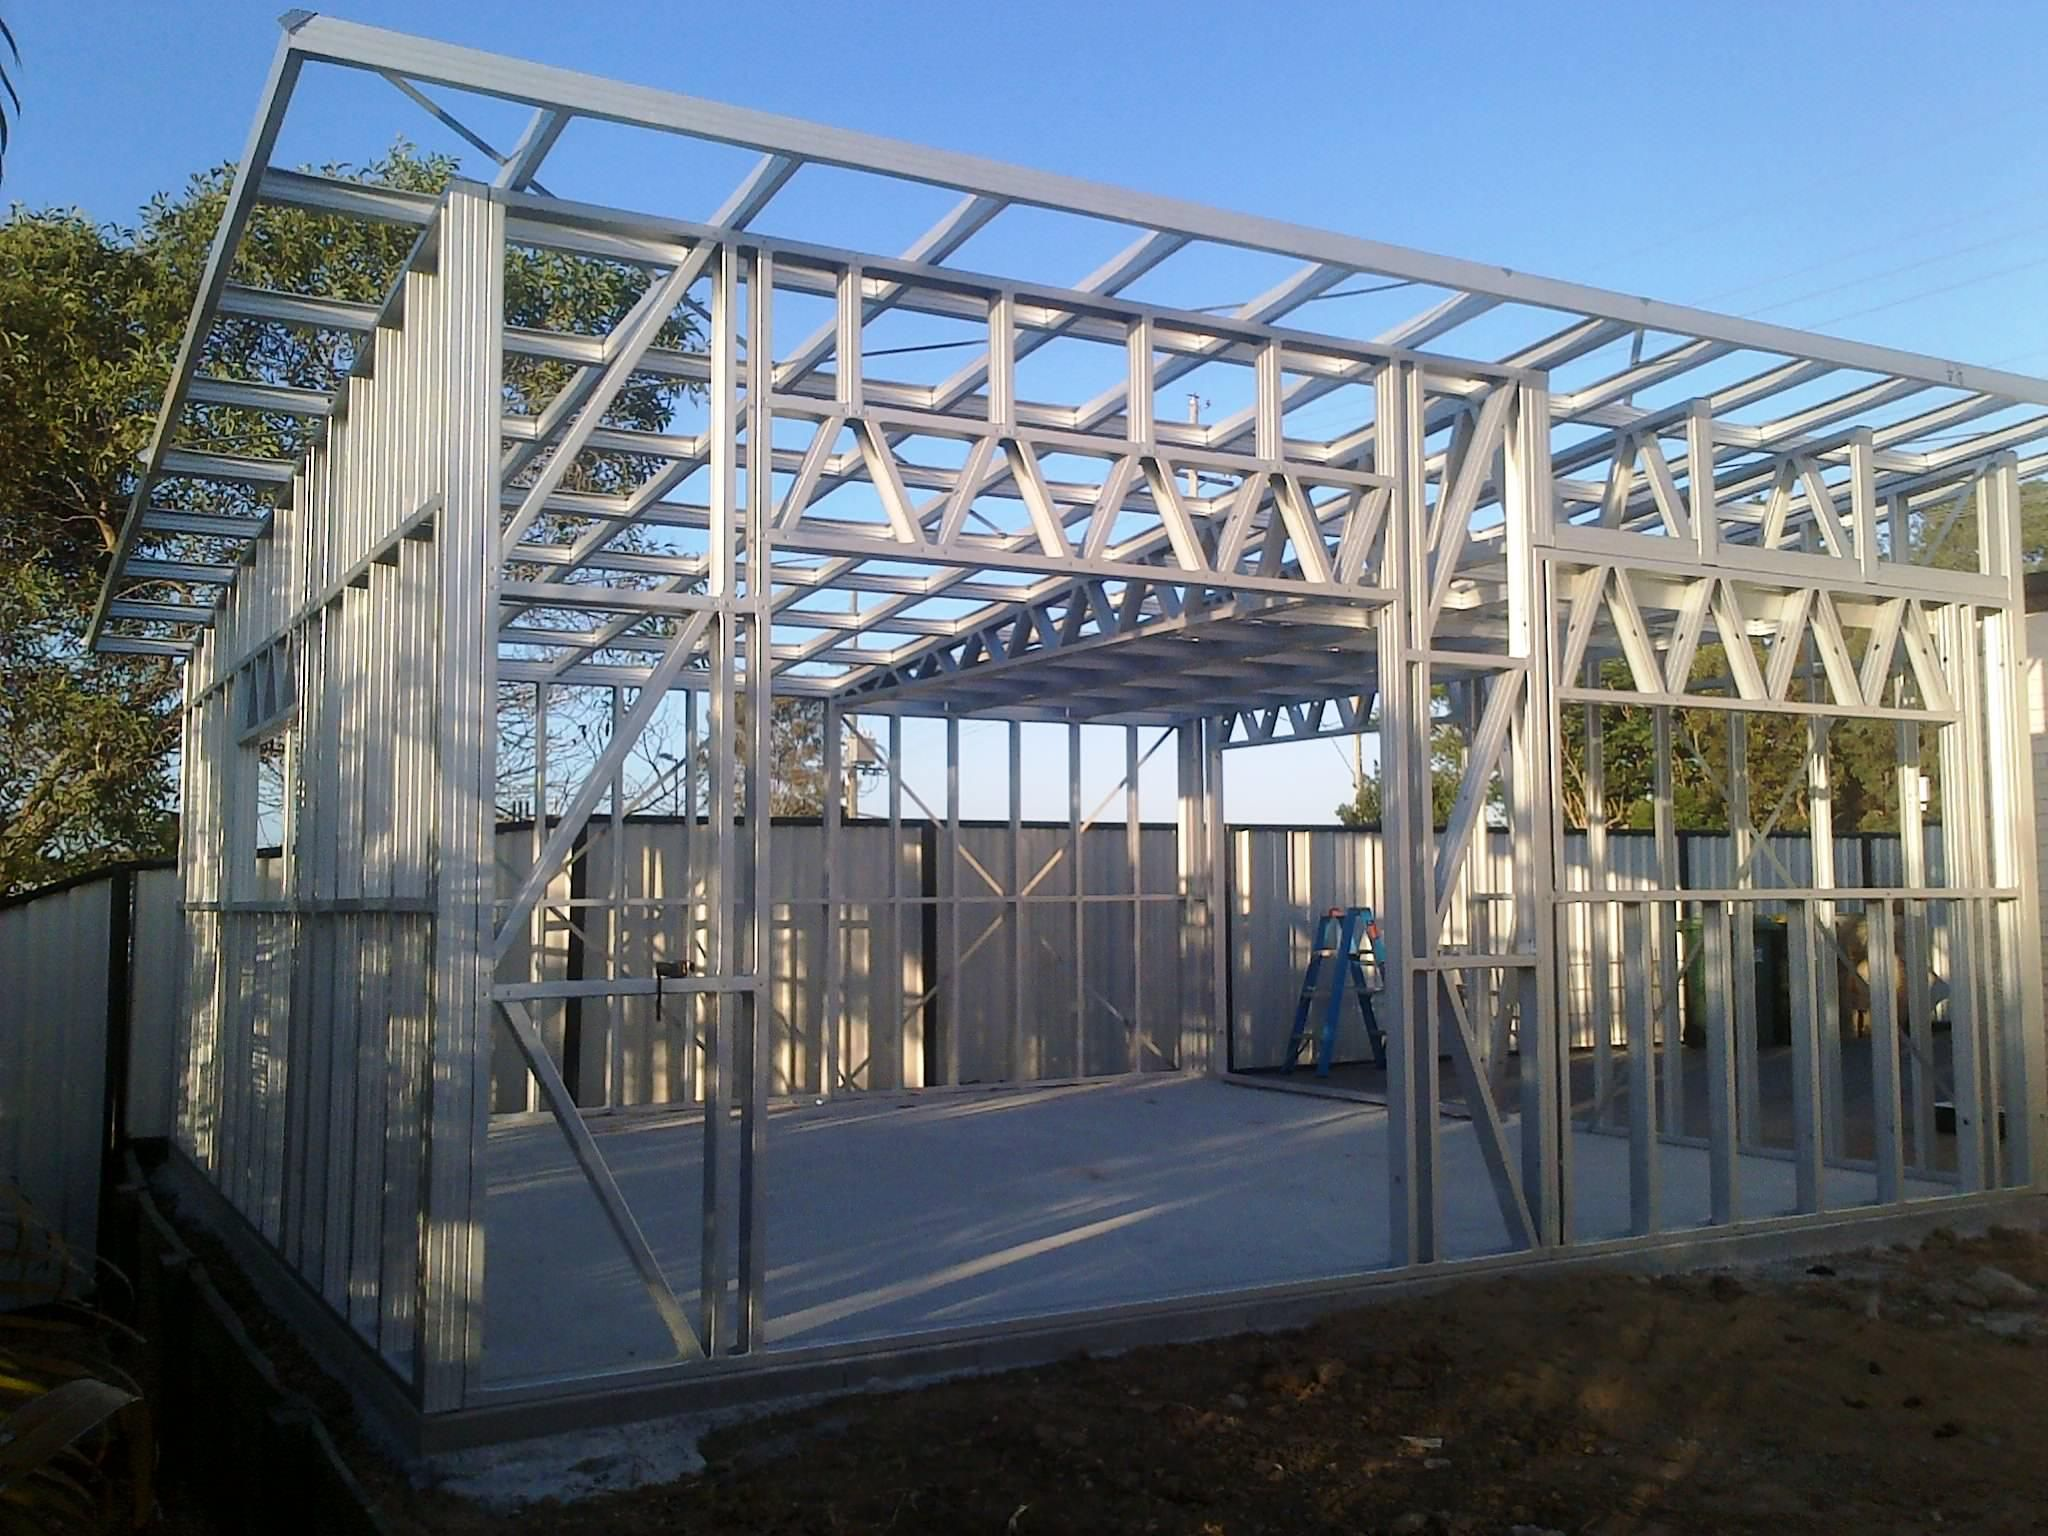 Modern Steel Truss Roof Design Ideas Home . Simple Models